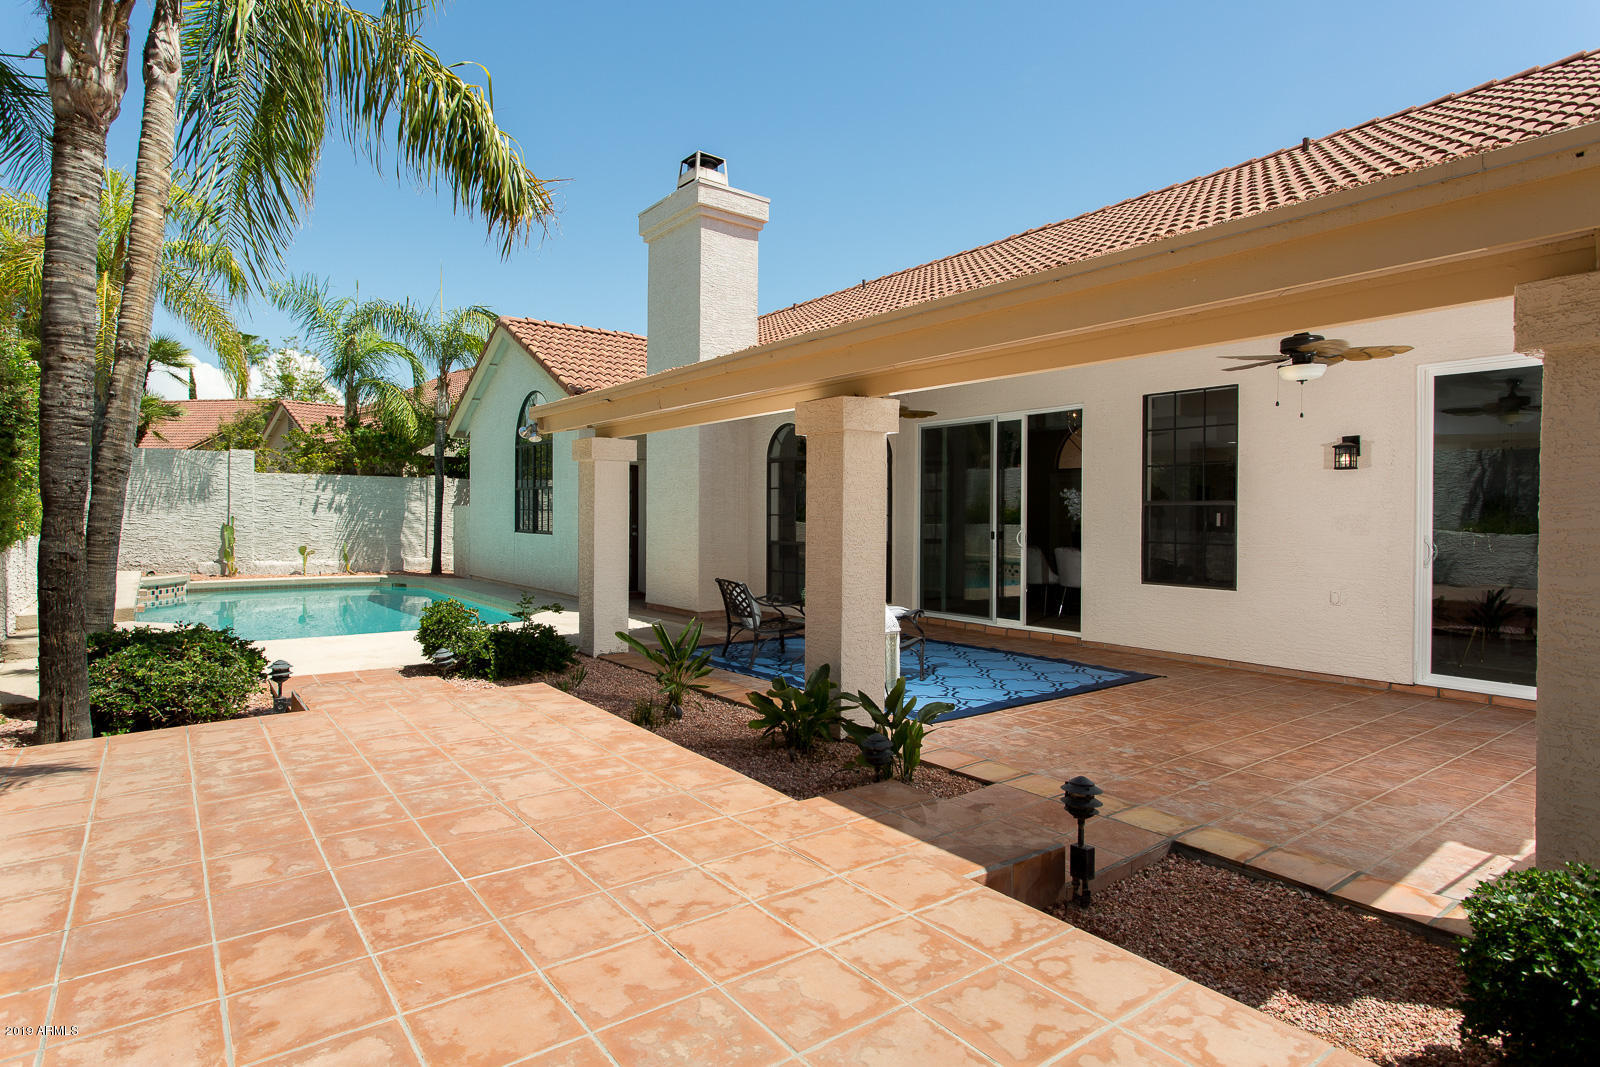 MLS 5961736 10142 E DREYFUS Avenue, Scottsdale, AZ 85260 Scottsdale AZ Private Pool